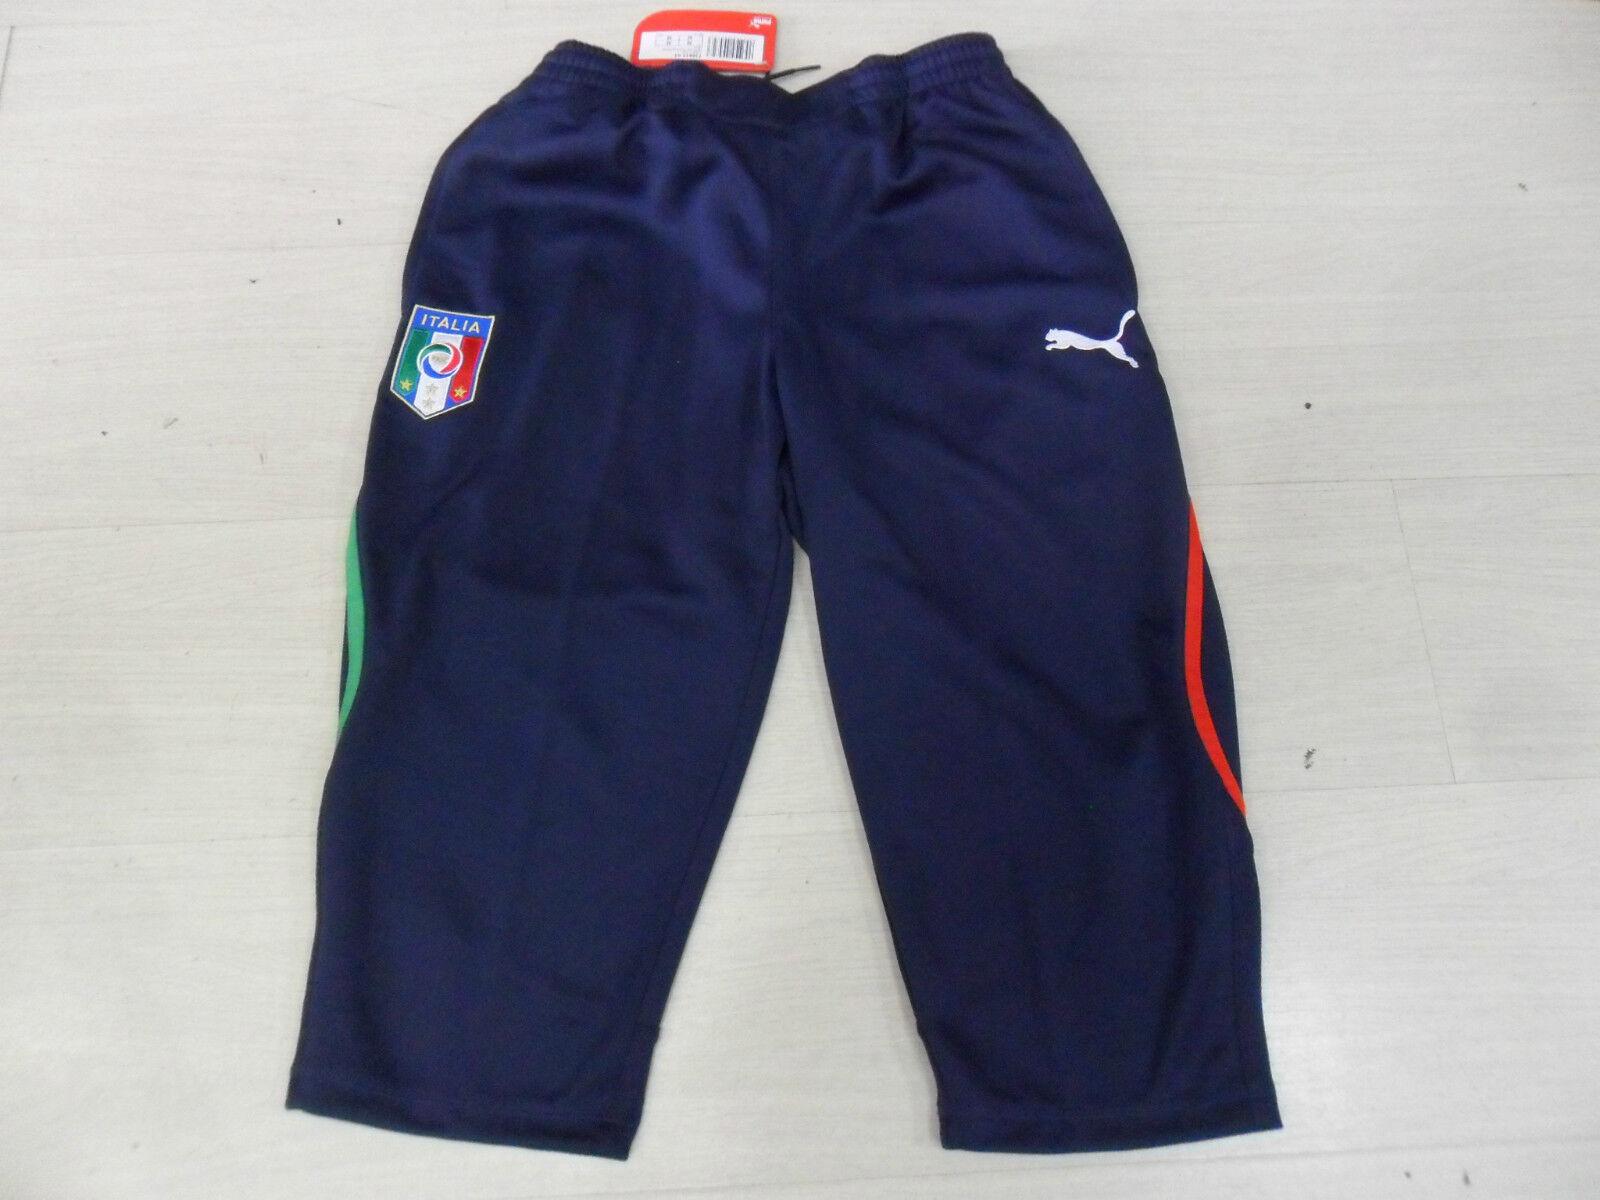 0725 TG XS XS XS ITALIEN ITALY BERMUDA 3 4 TRAINING SHORTS SHORTS HOSE PANTS 51649a